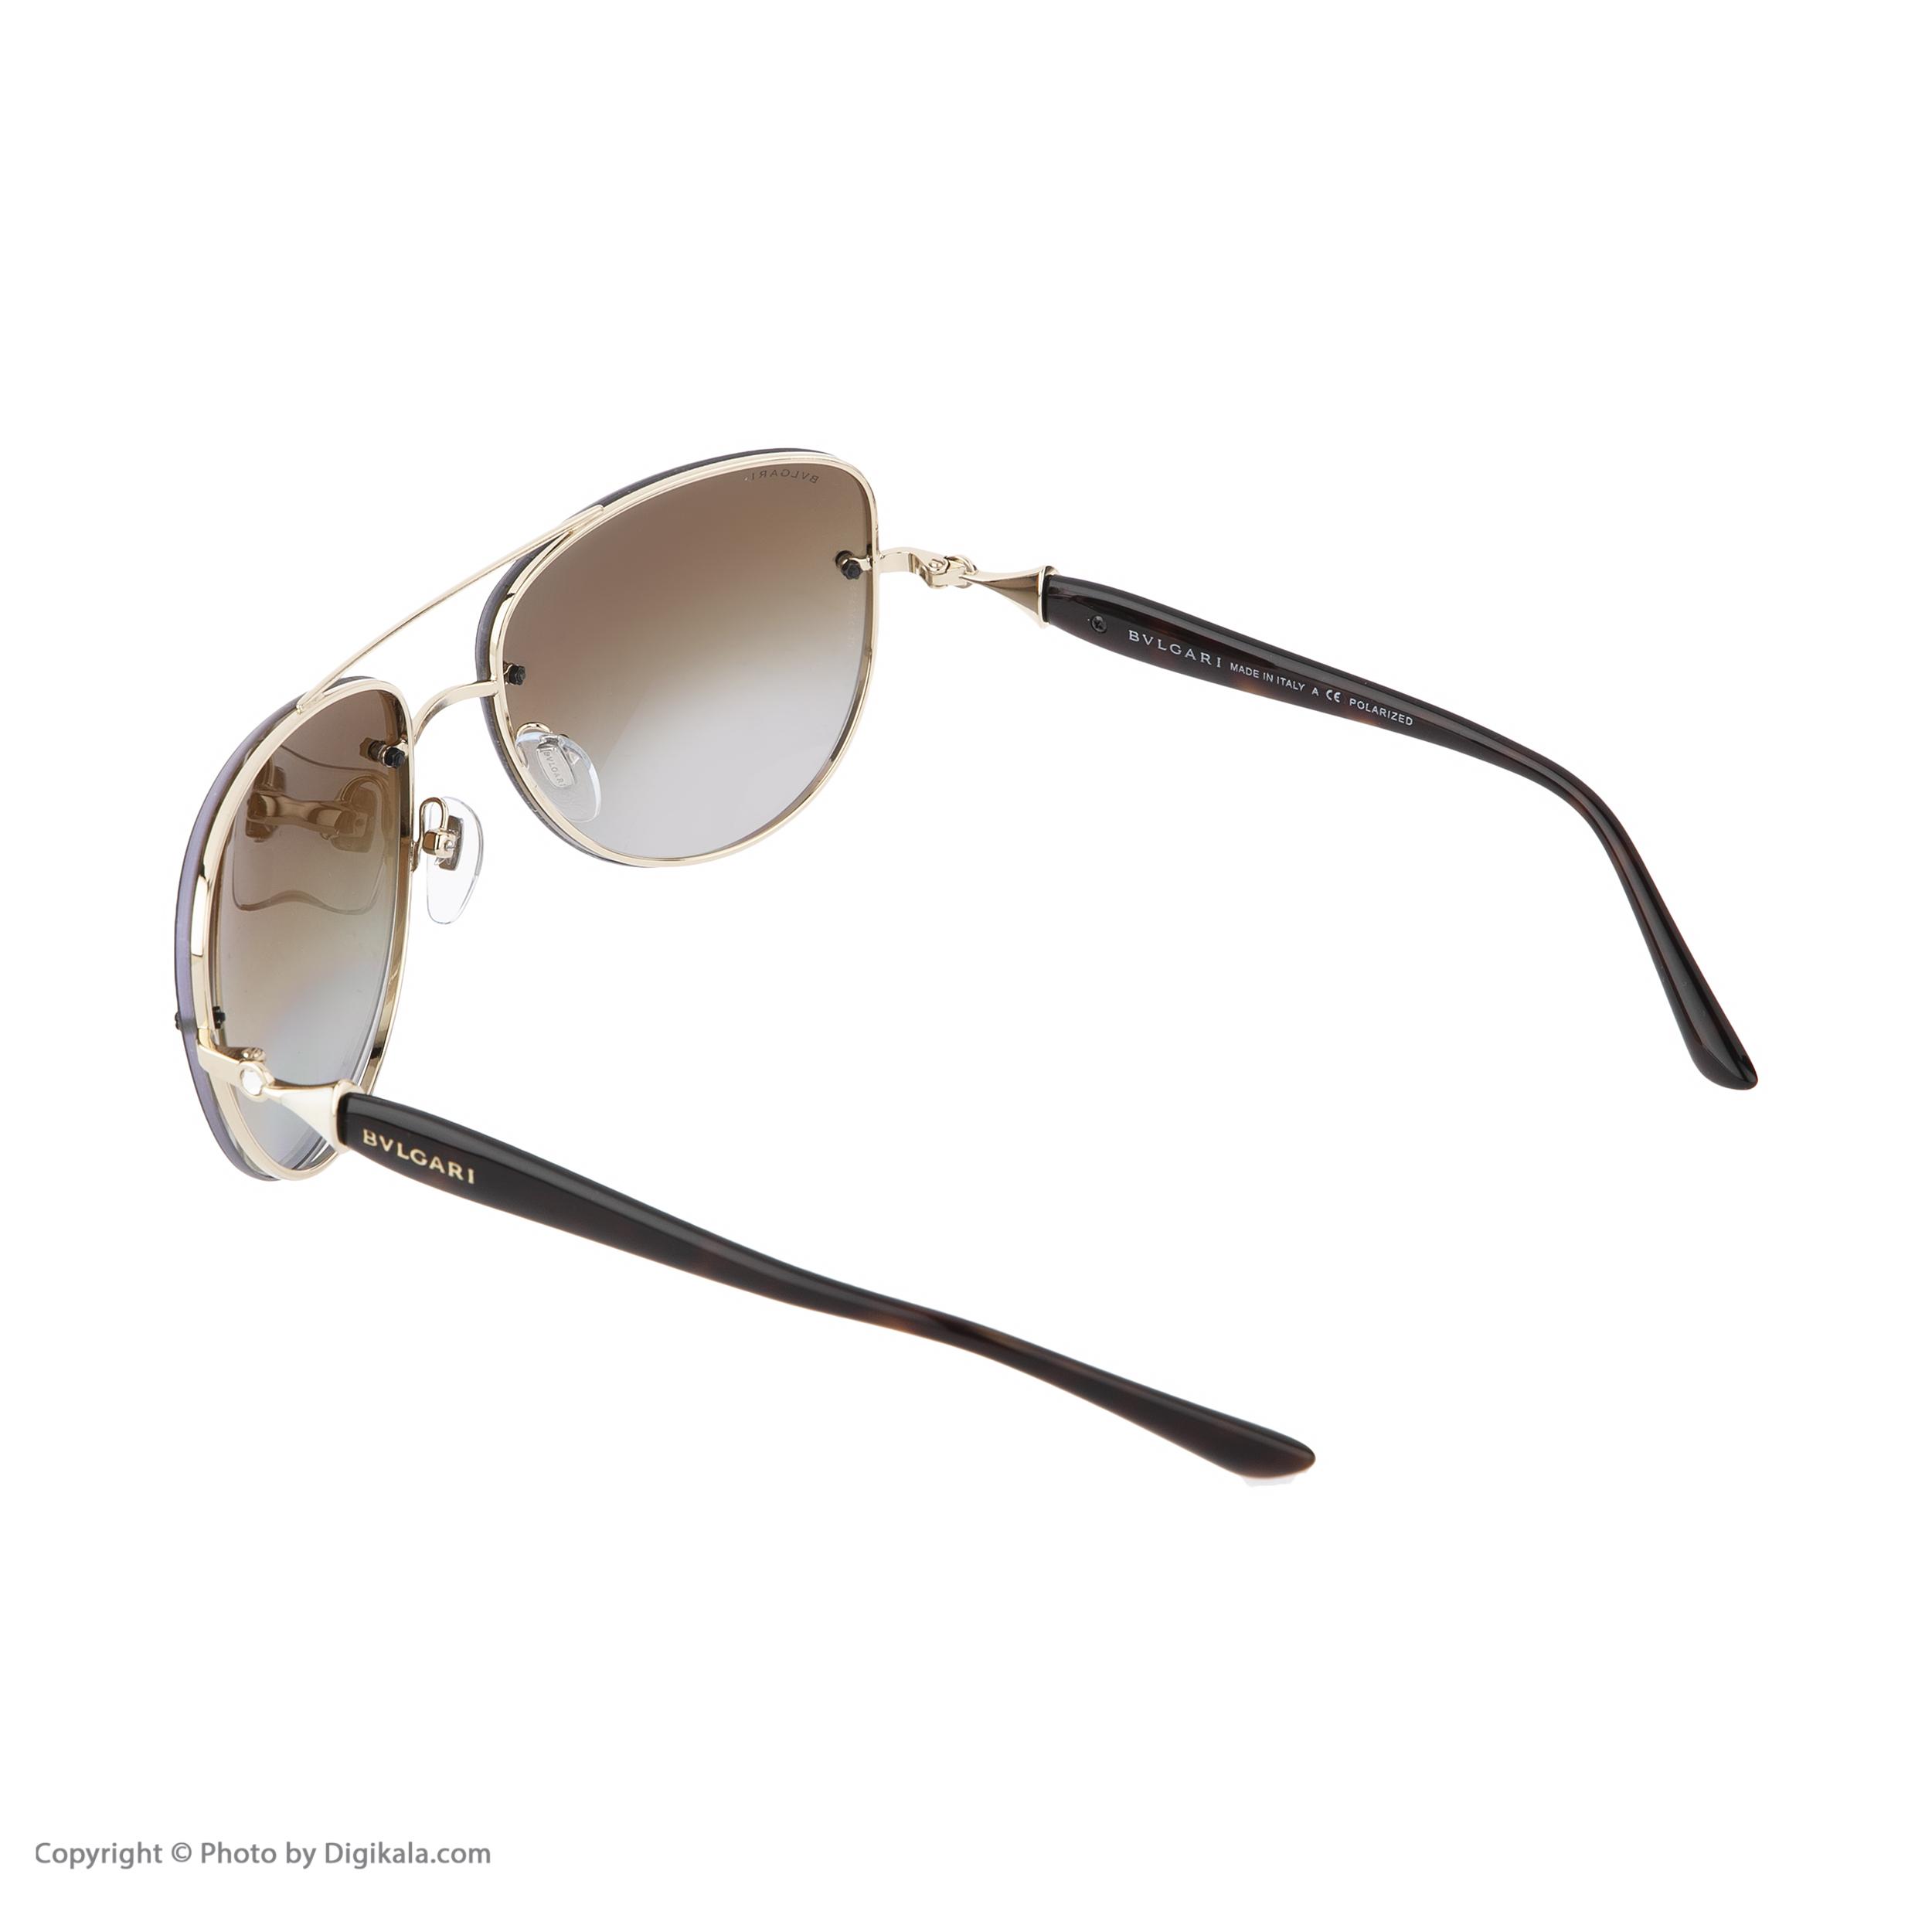 عینک آفتابی مردانه بولگاری مدل BV6086B 0278T5 -  - 5